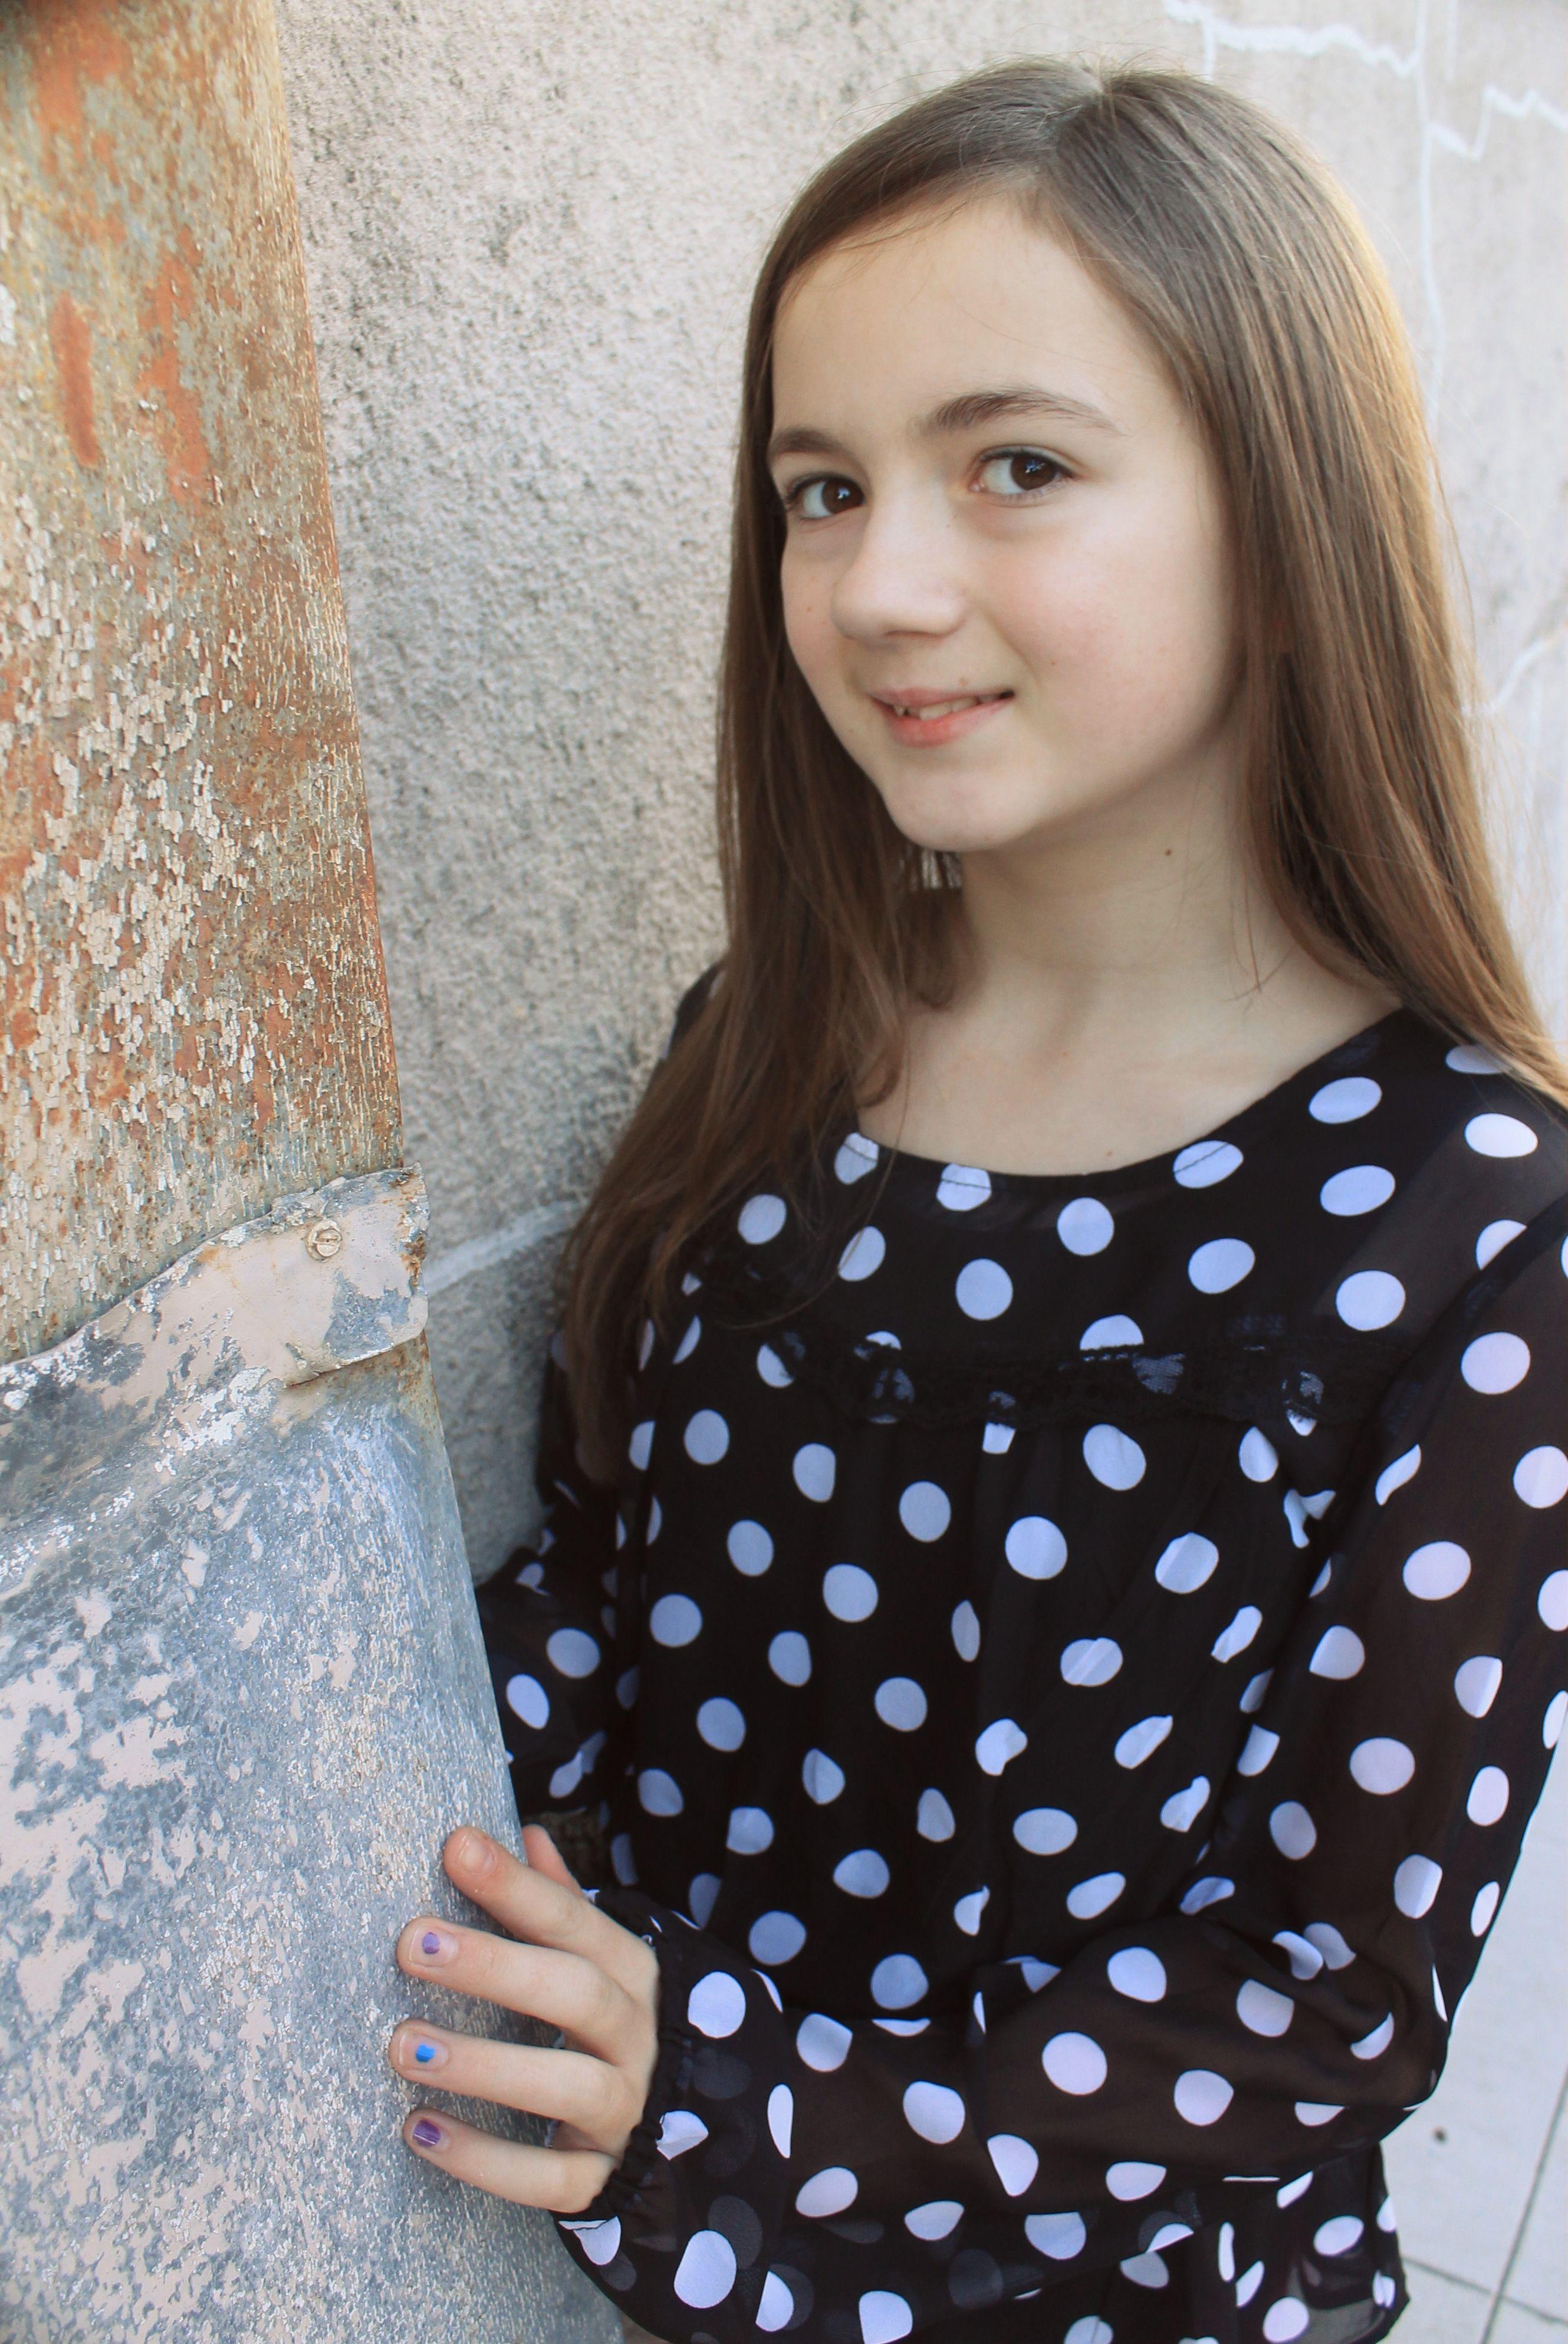 11 Year Old Girl